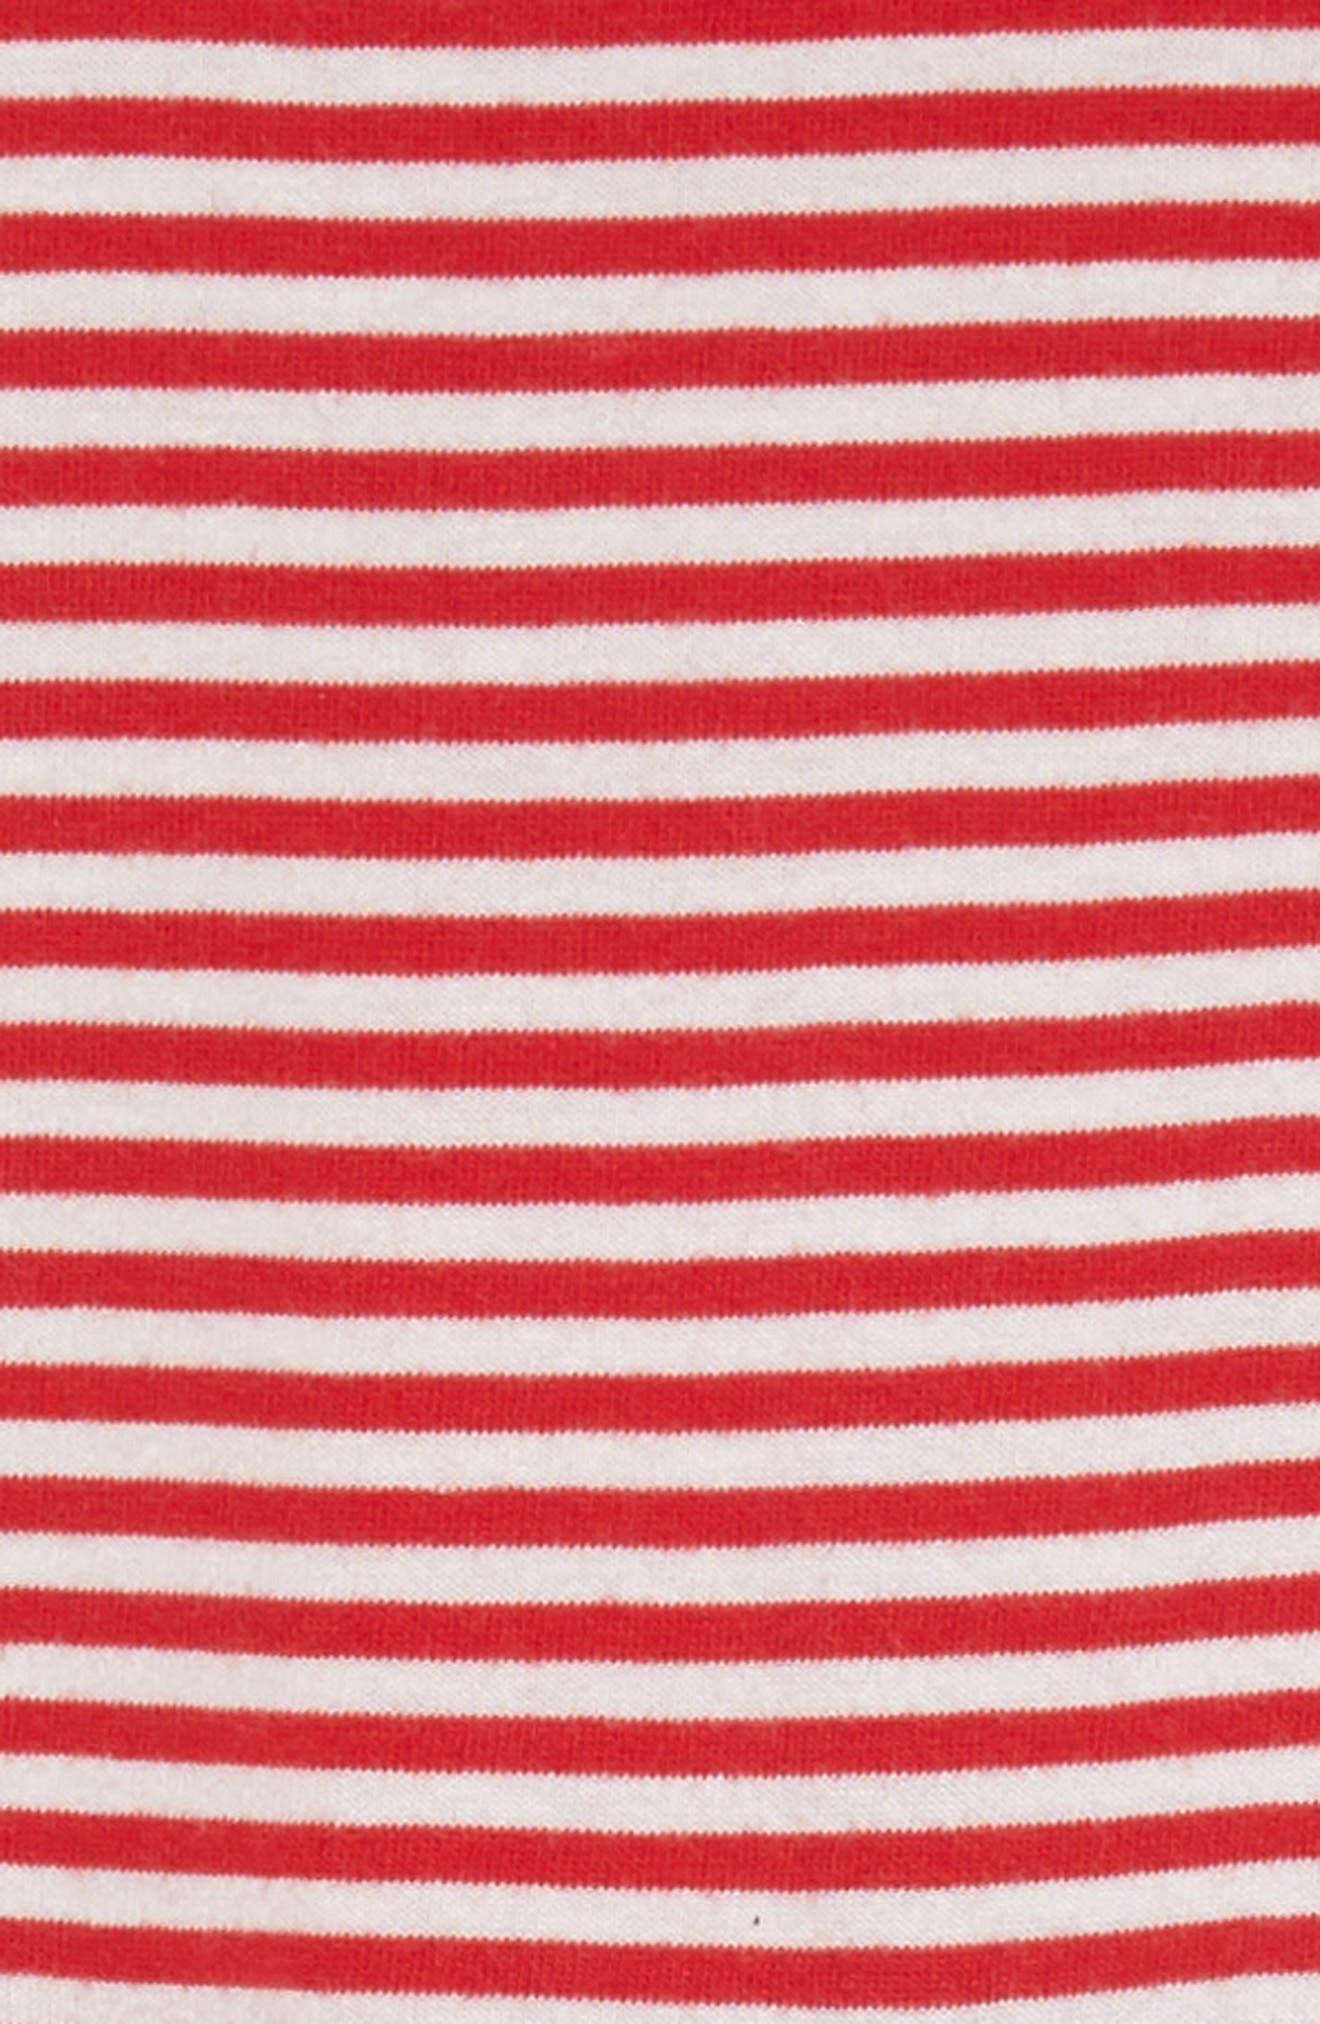 Stripe Jersey Dress,                             Alternate thumbnail 3, color,                             Circus Red/ Ecru